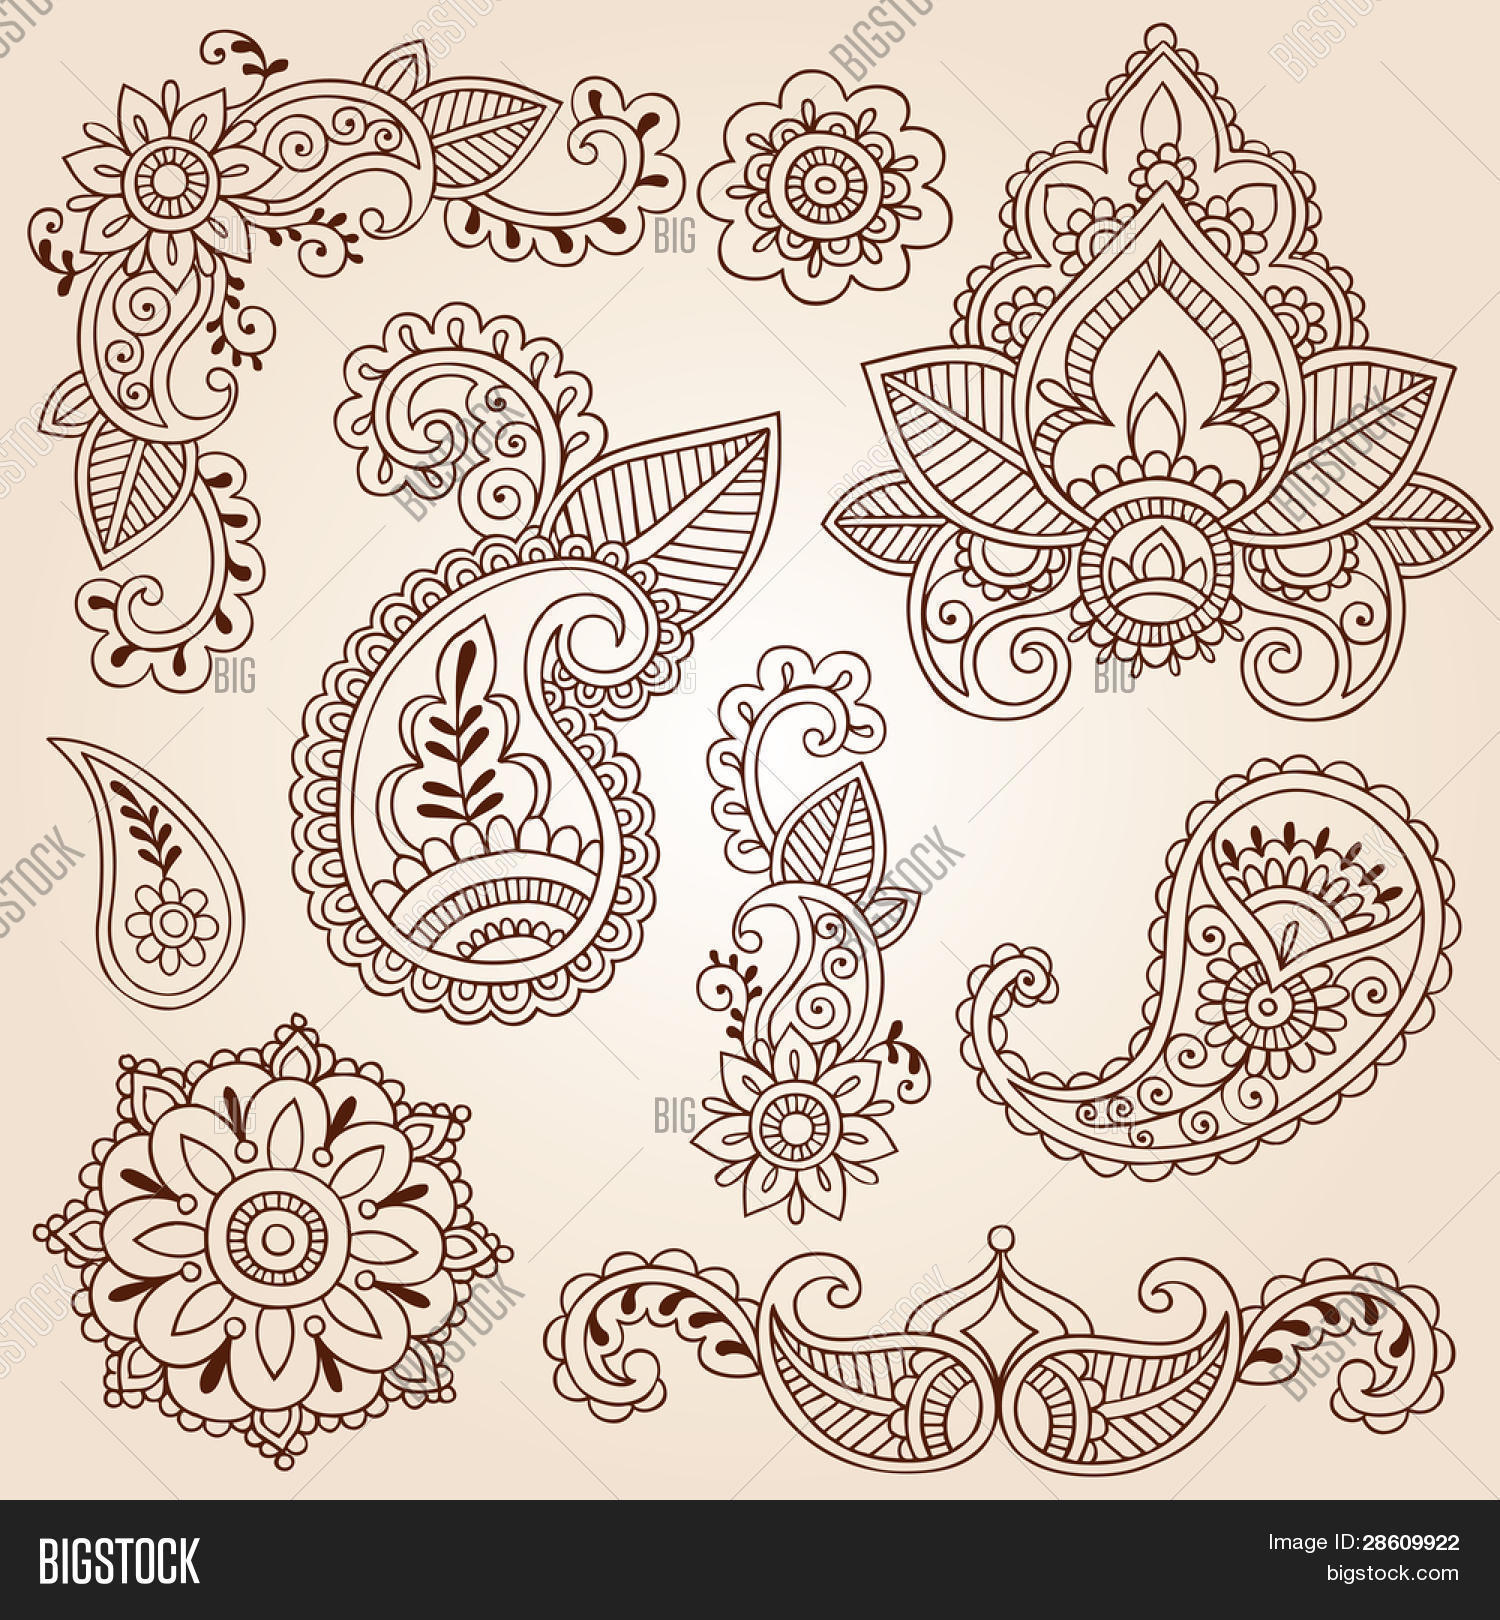 Henna Mehndi Doodles Vector & Photo (Free Trial) | Bigstock